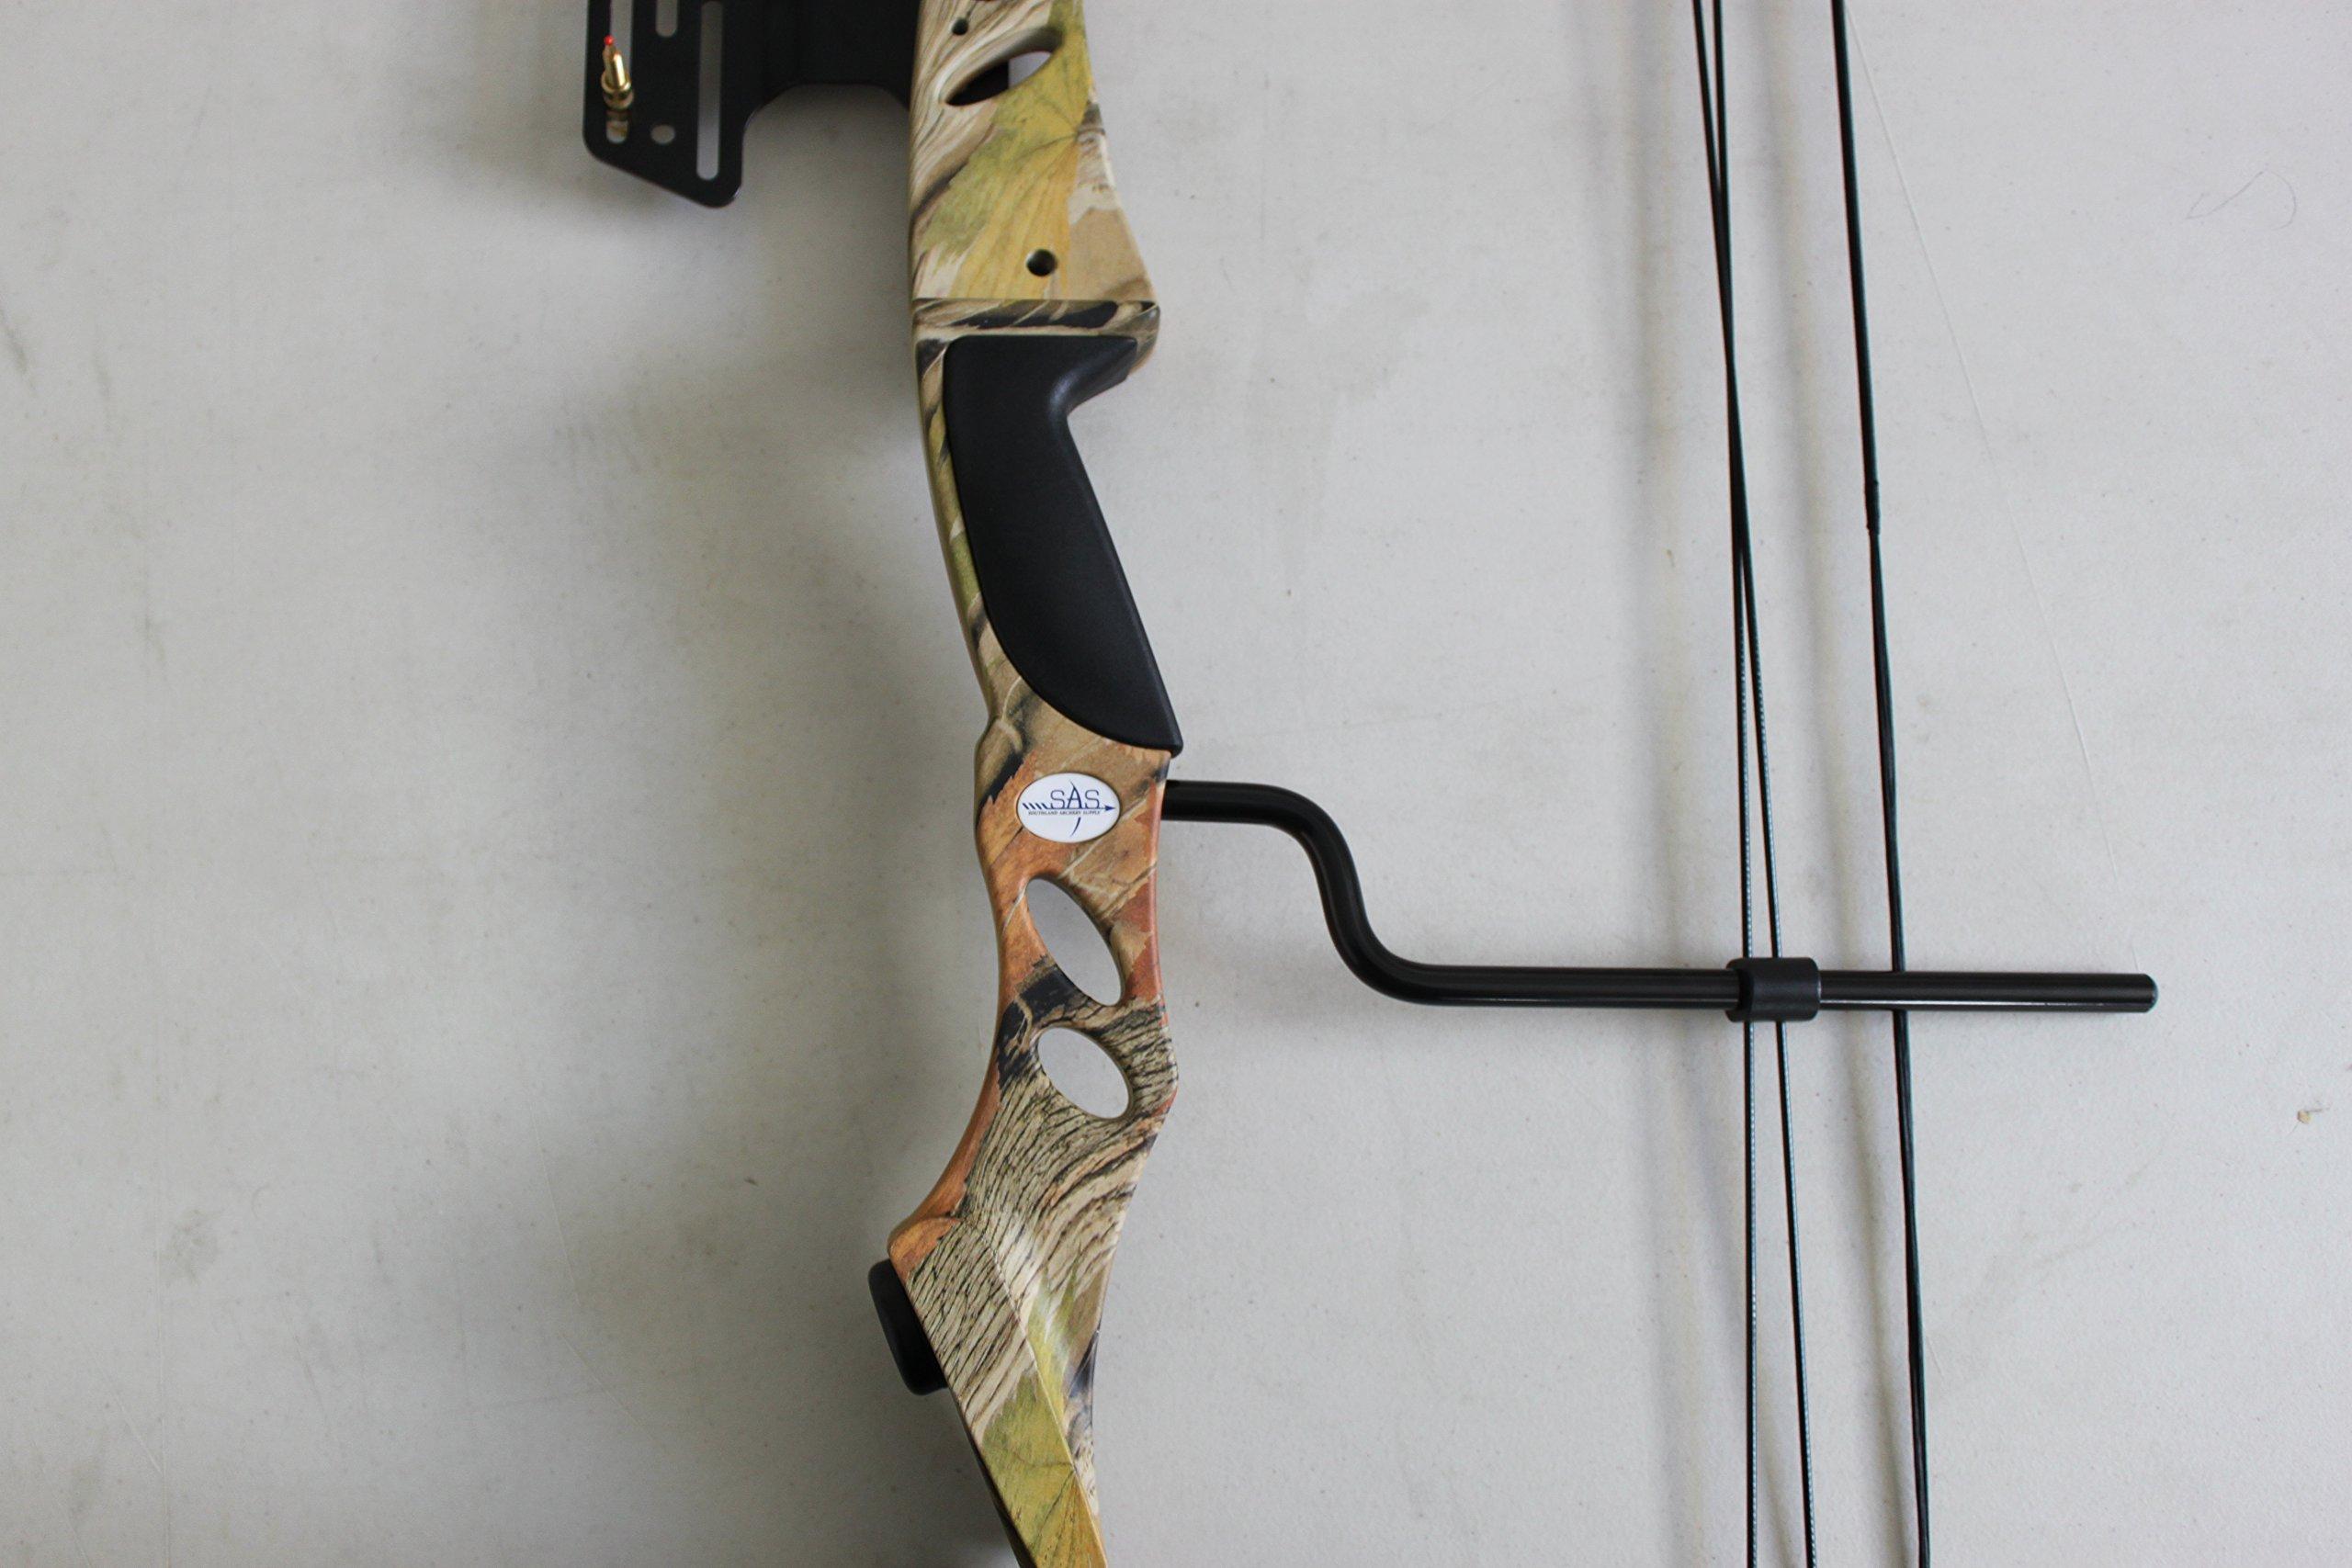 SAS Siege 55 lb Compound Bow w/ 5-Spot Paper Target - Camo by Siege